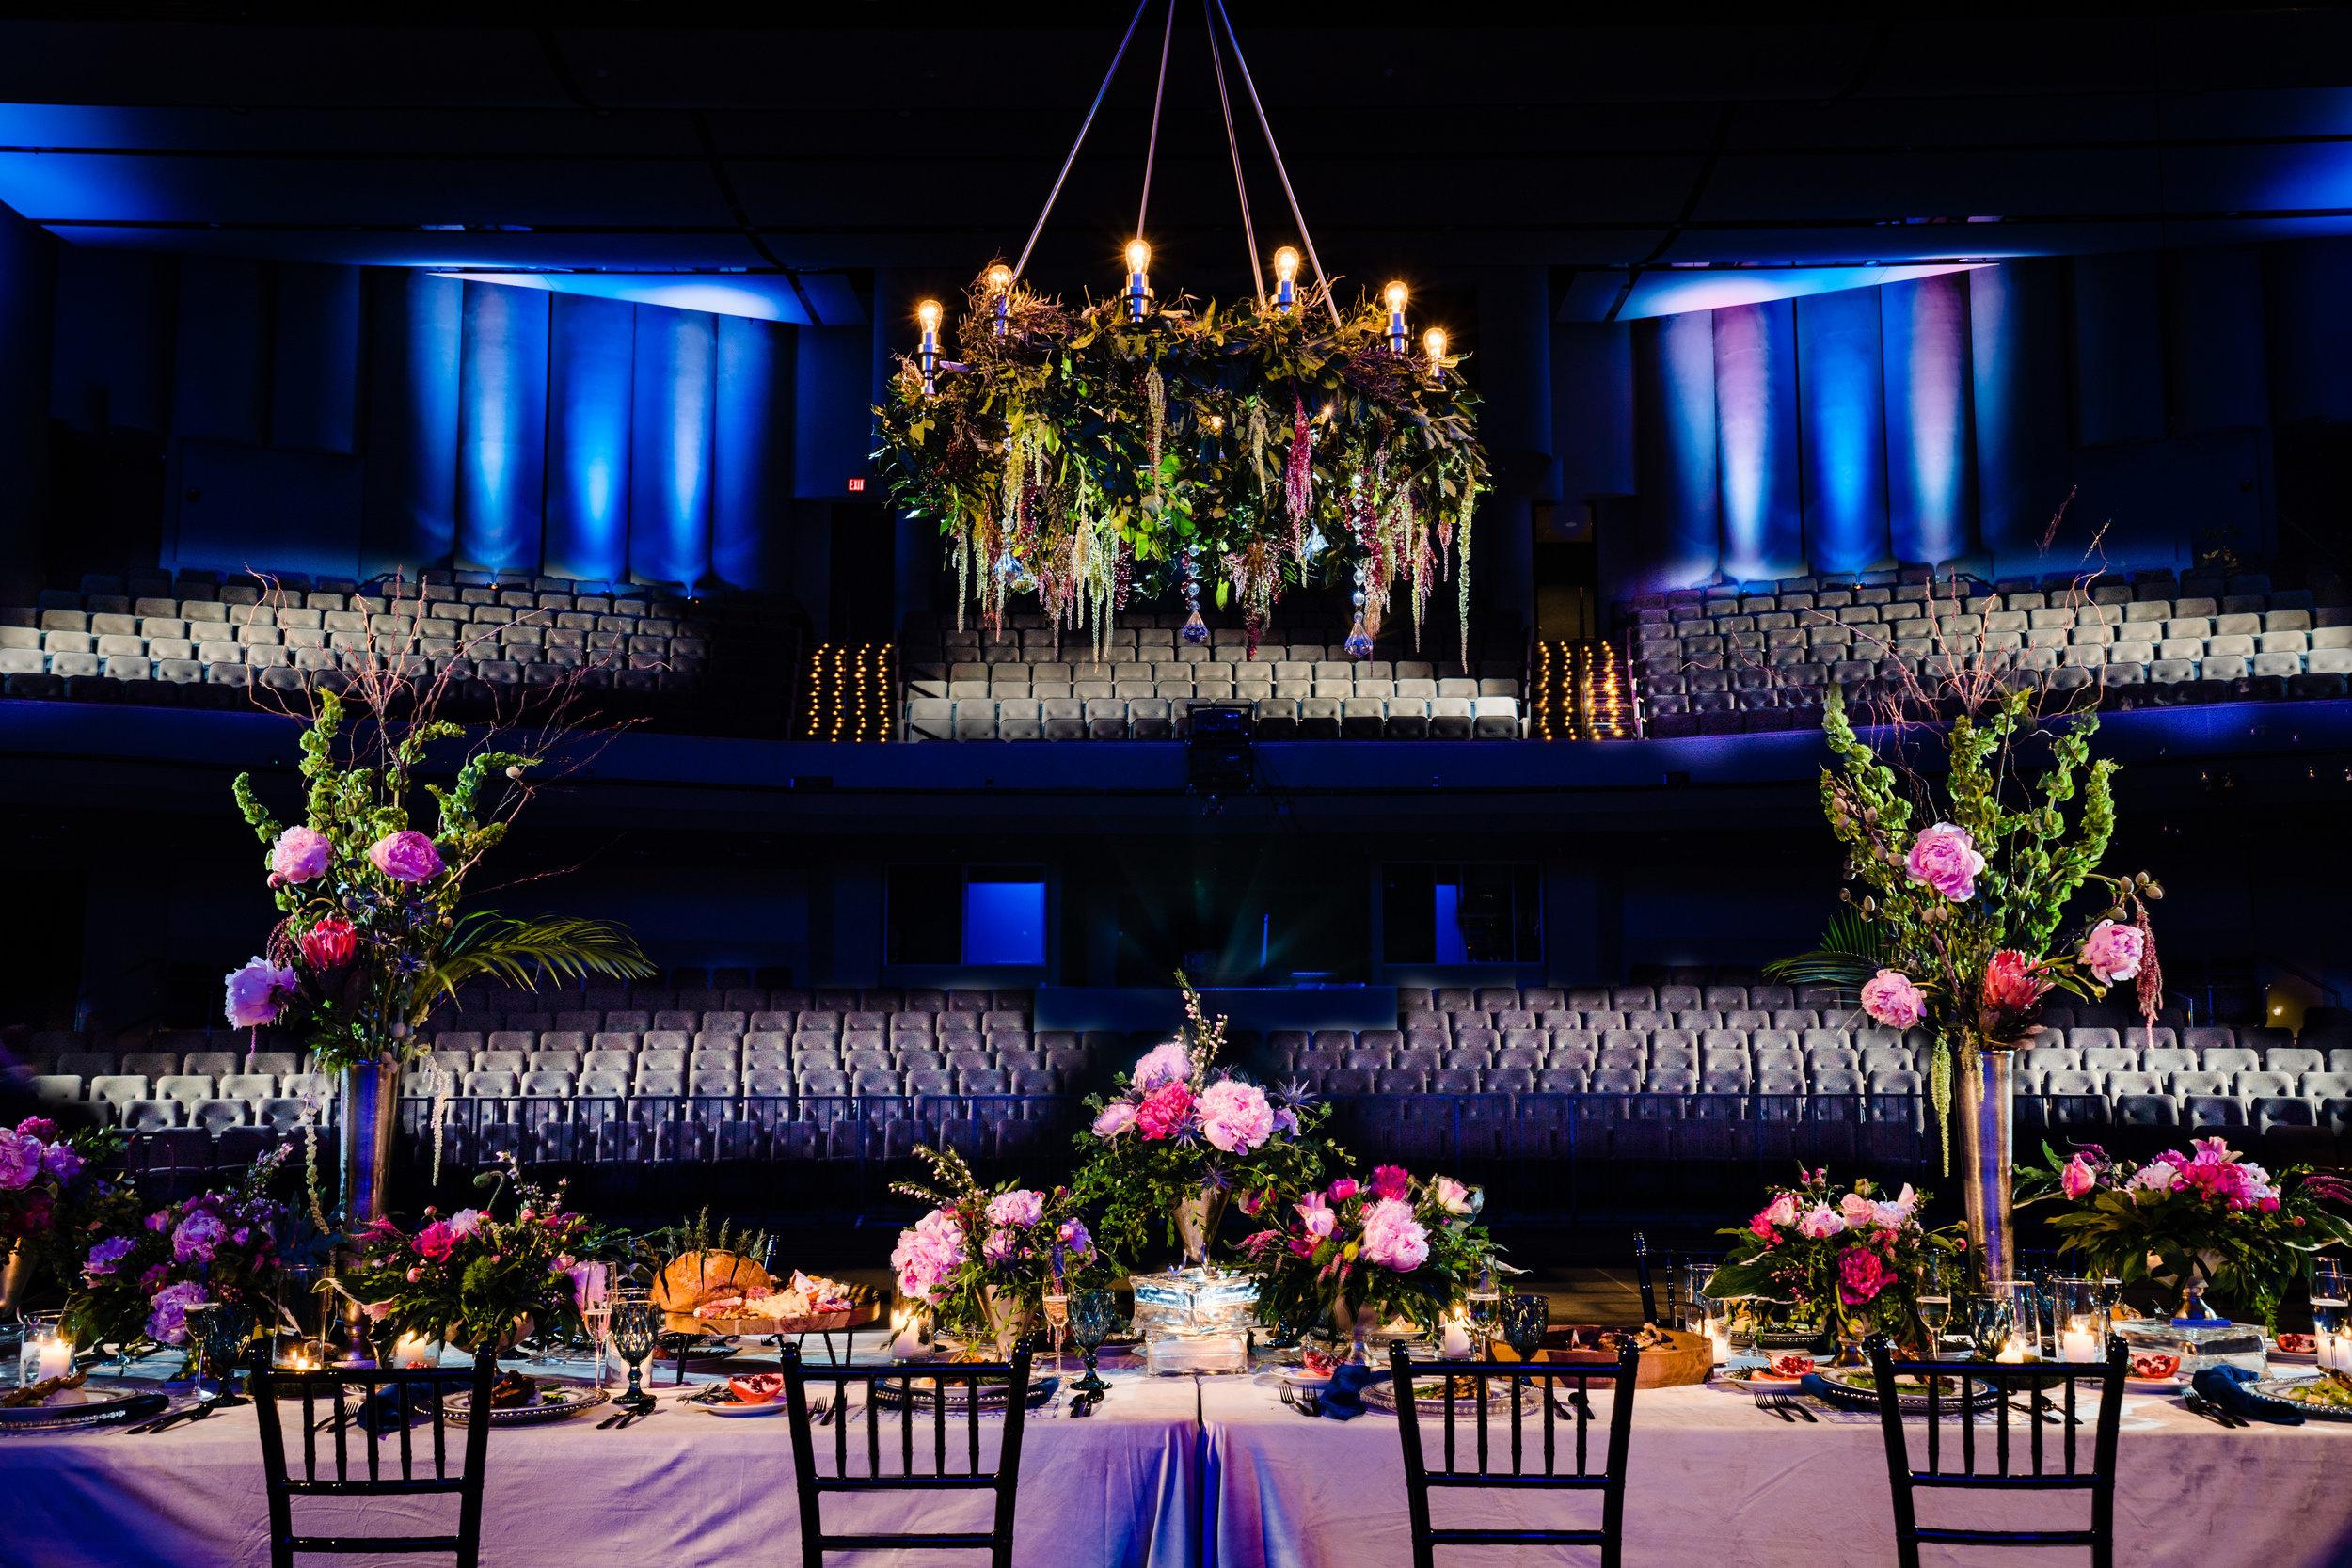 Walton-Arts-center-wedding-northwest-arkansas-wedding-photography-vinson-images (1).jpg